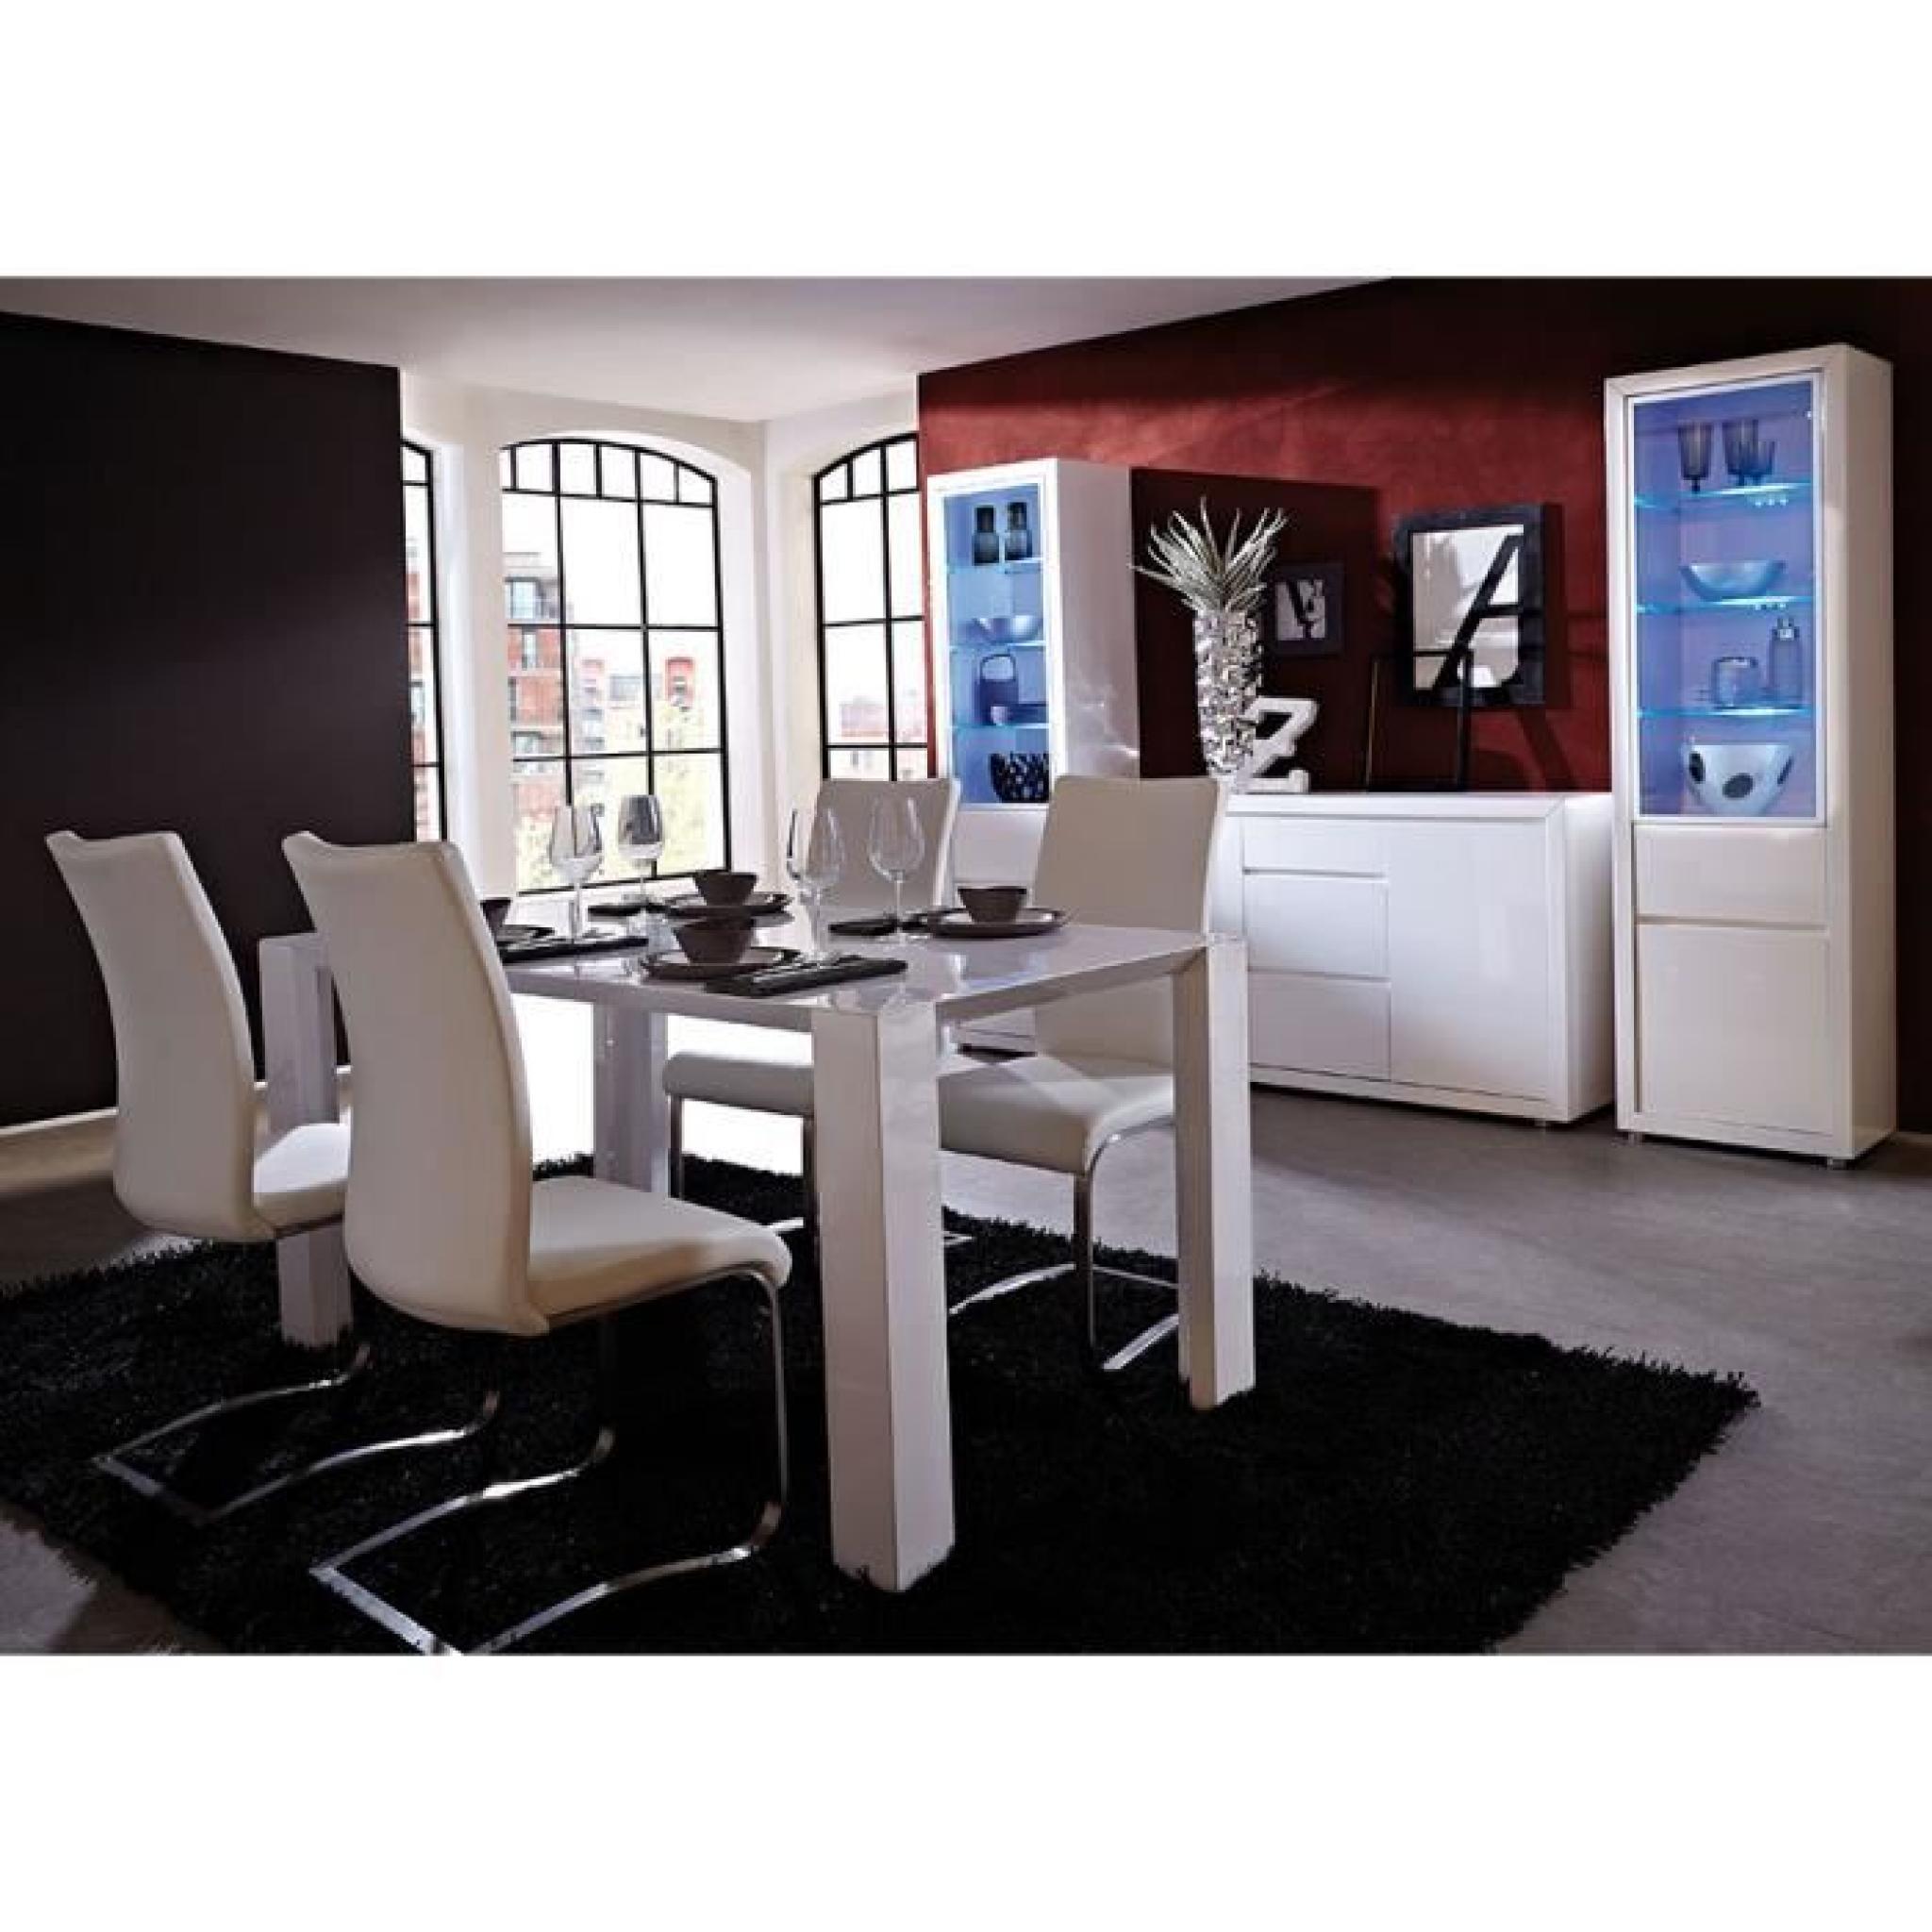 Salle manger compl te blanc laqu design aristo table for Ensemble salle a manger led